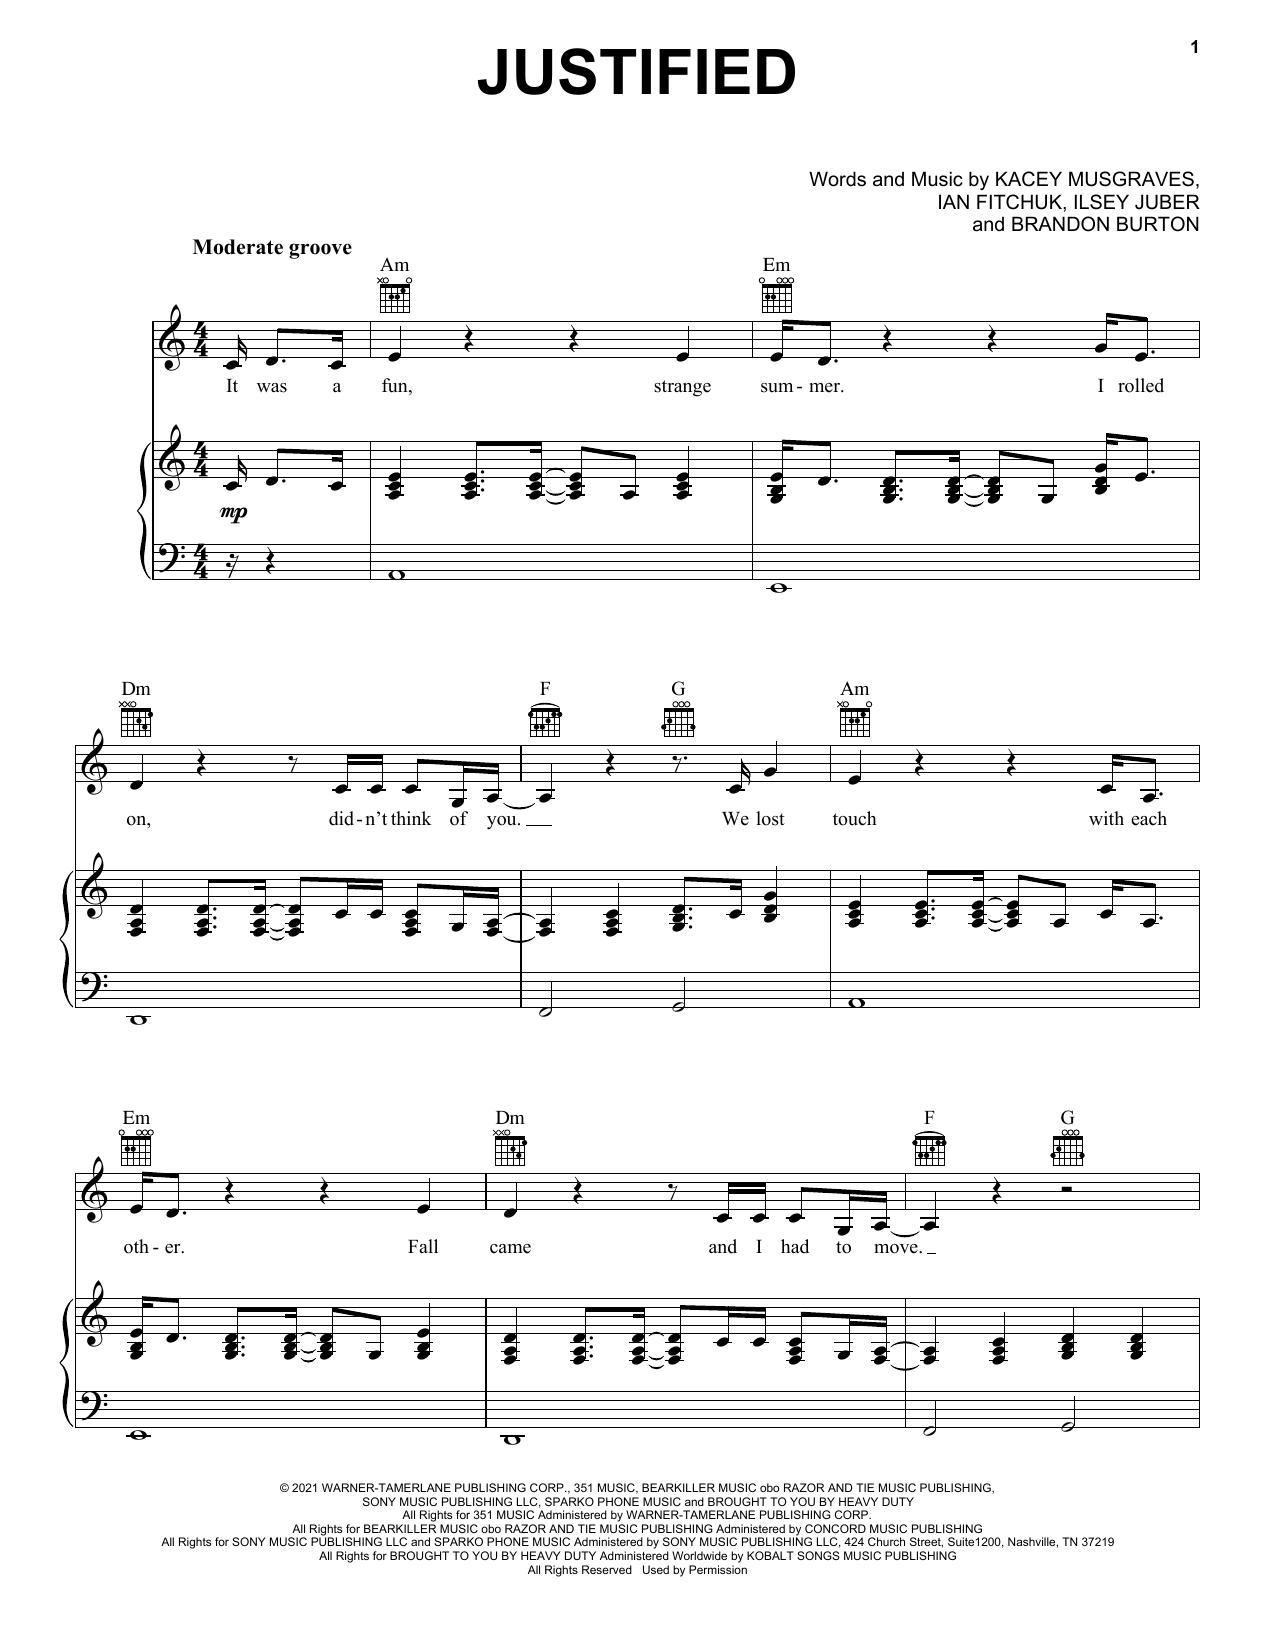 Kacey Musgraves Justified sheet music notes and chords. Download Printable PDF.